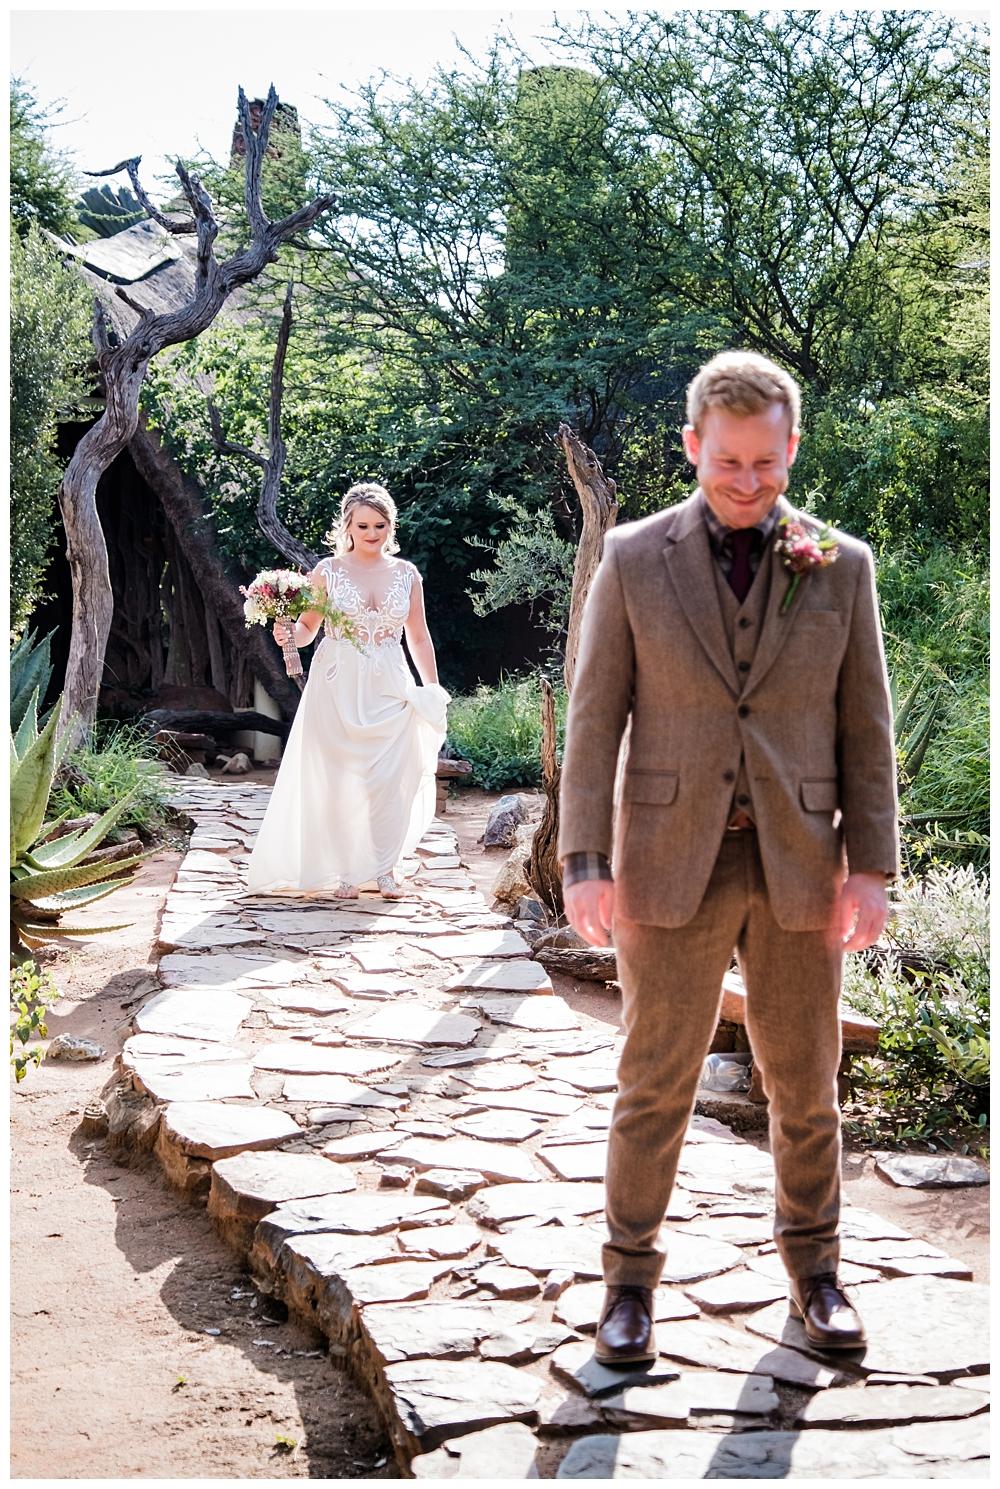 Best_Wedding_Photographer_AlexanderSmith_0095.jpg